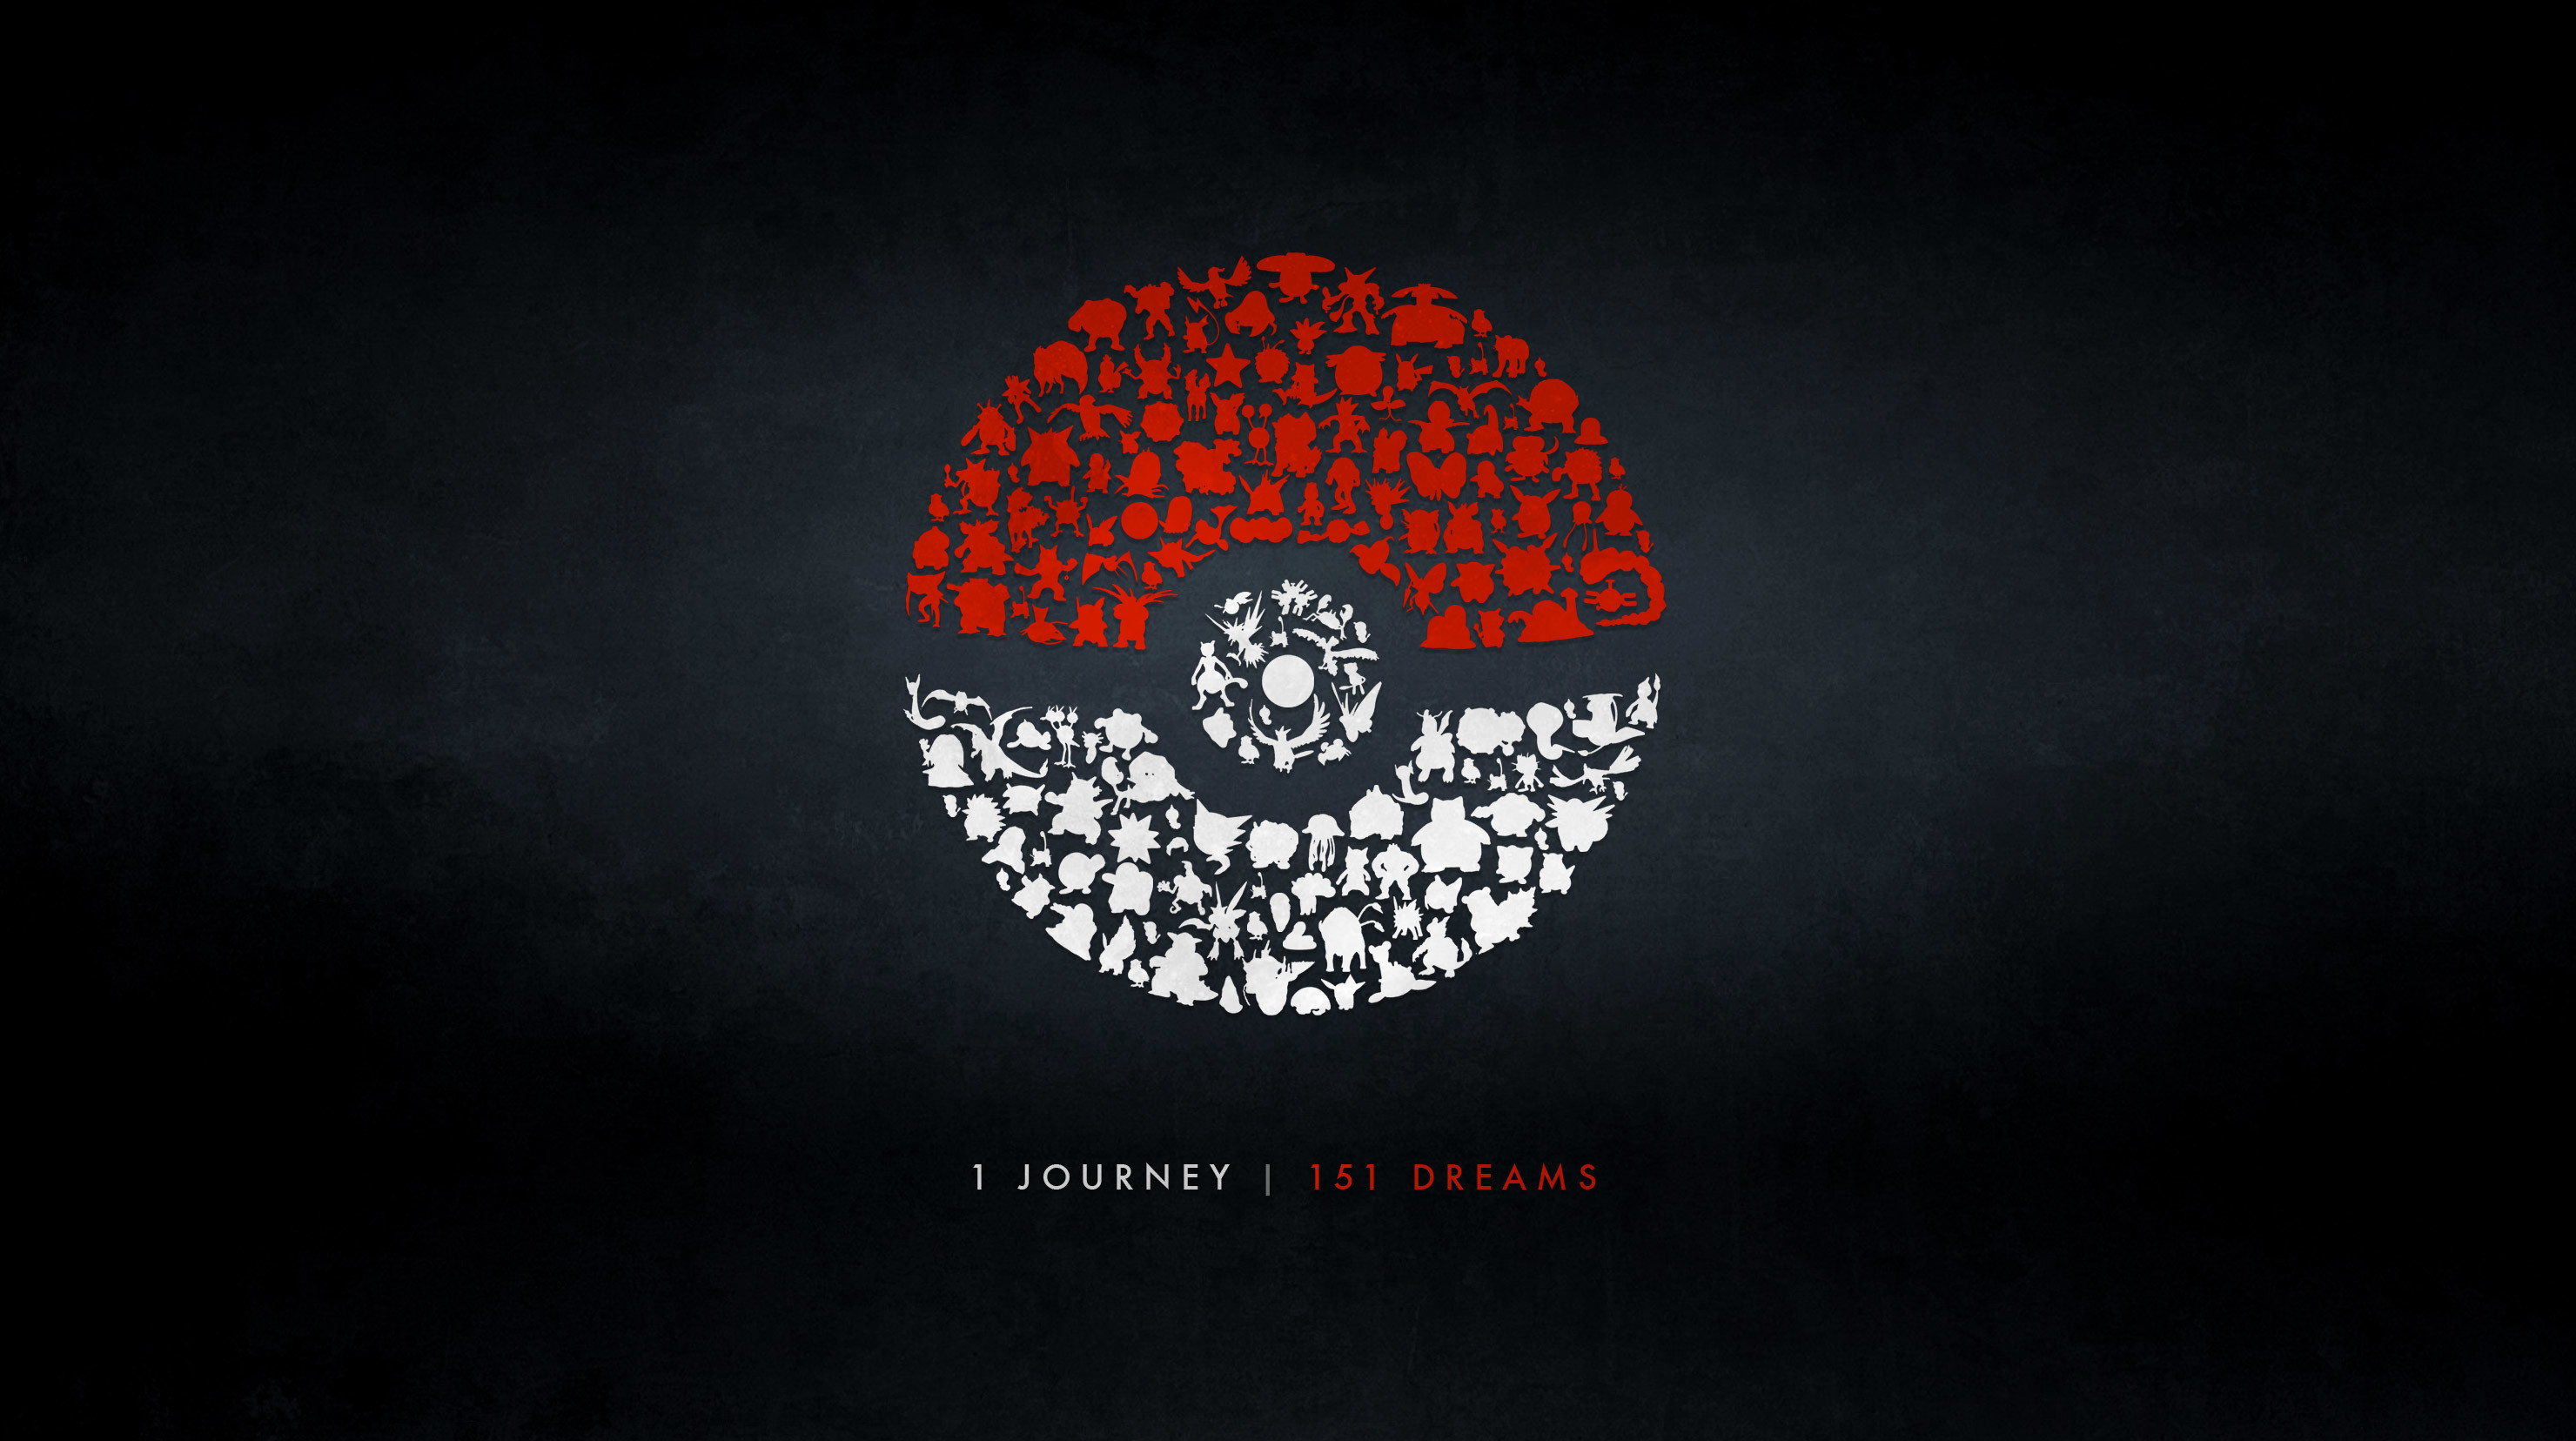 Pokemon GO HD 2048×2048 Resolution